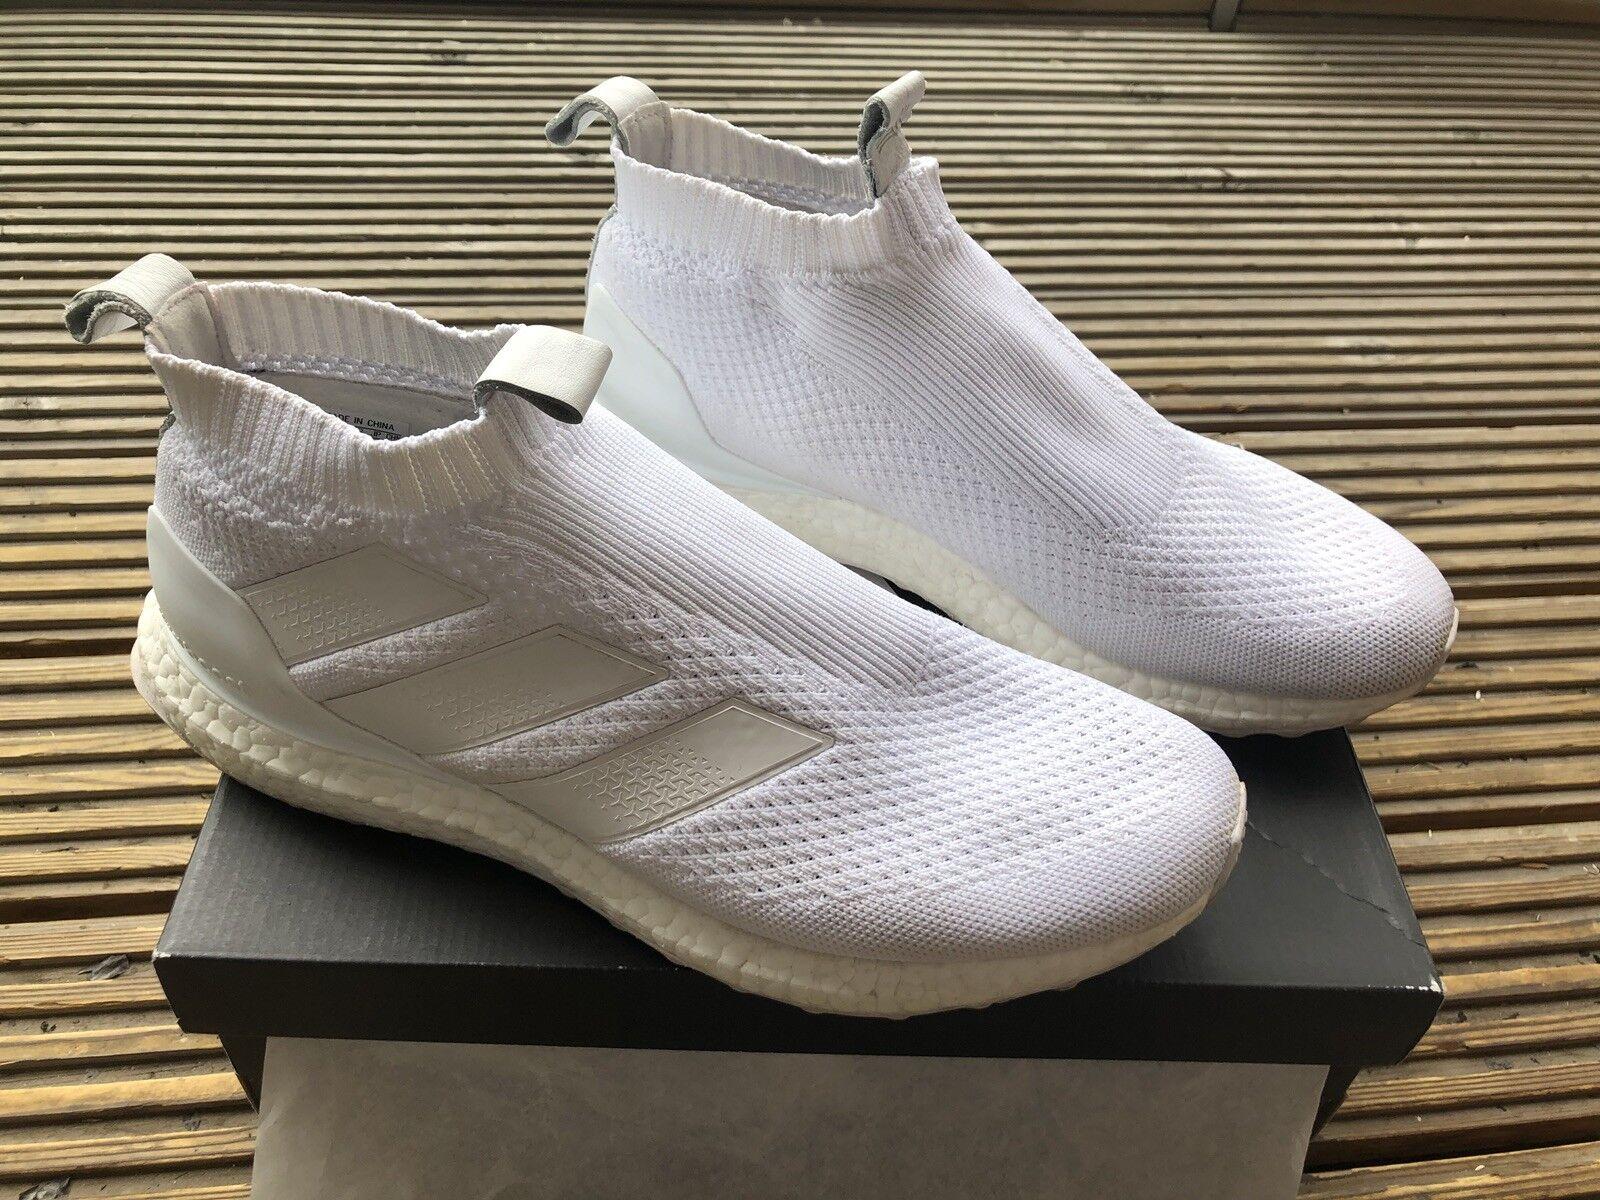 Adidas A16 Tamaño Ultraboost Triple Usado Blanco Tamaño A16 9 8acaae